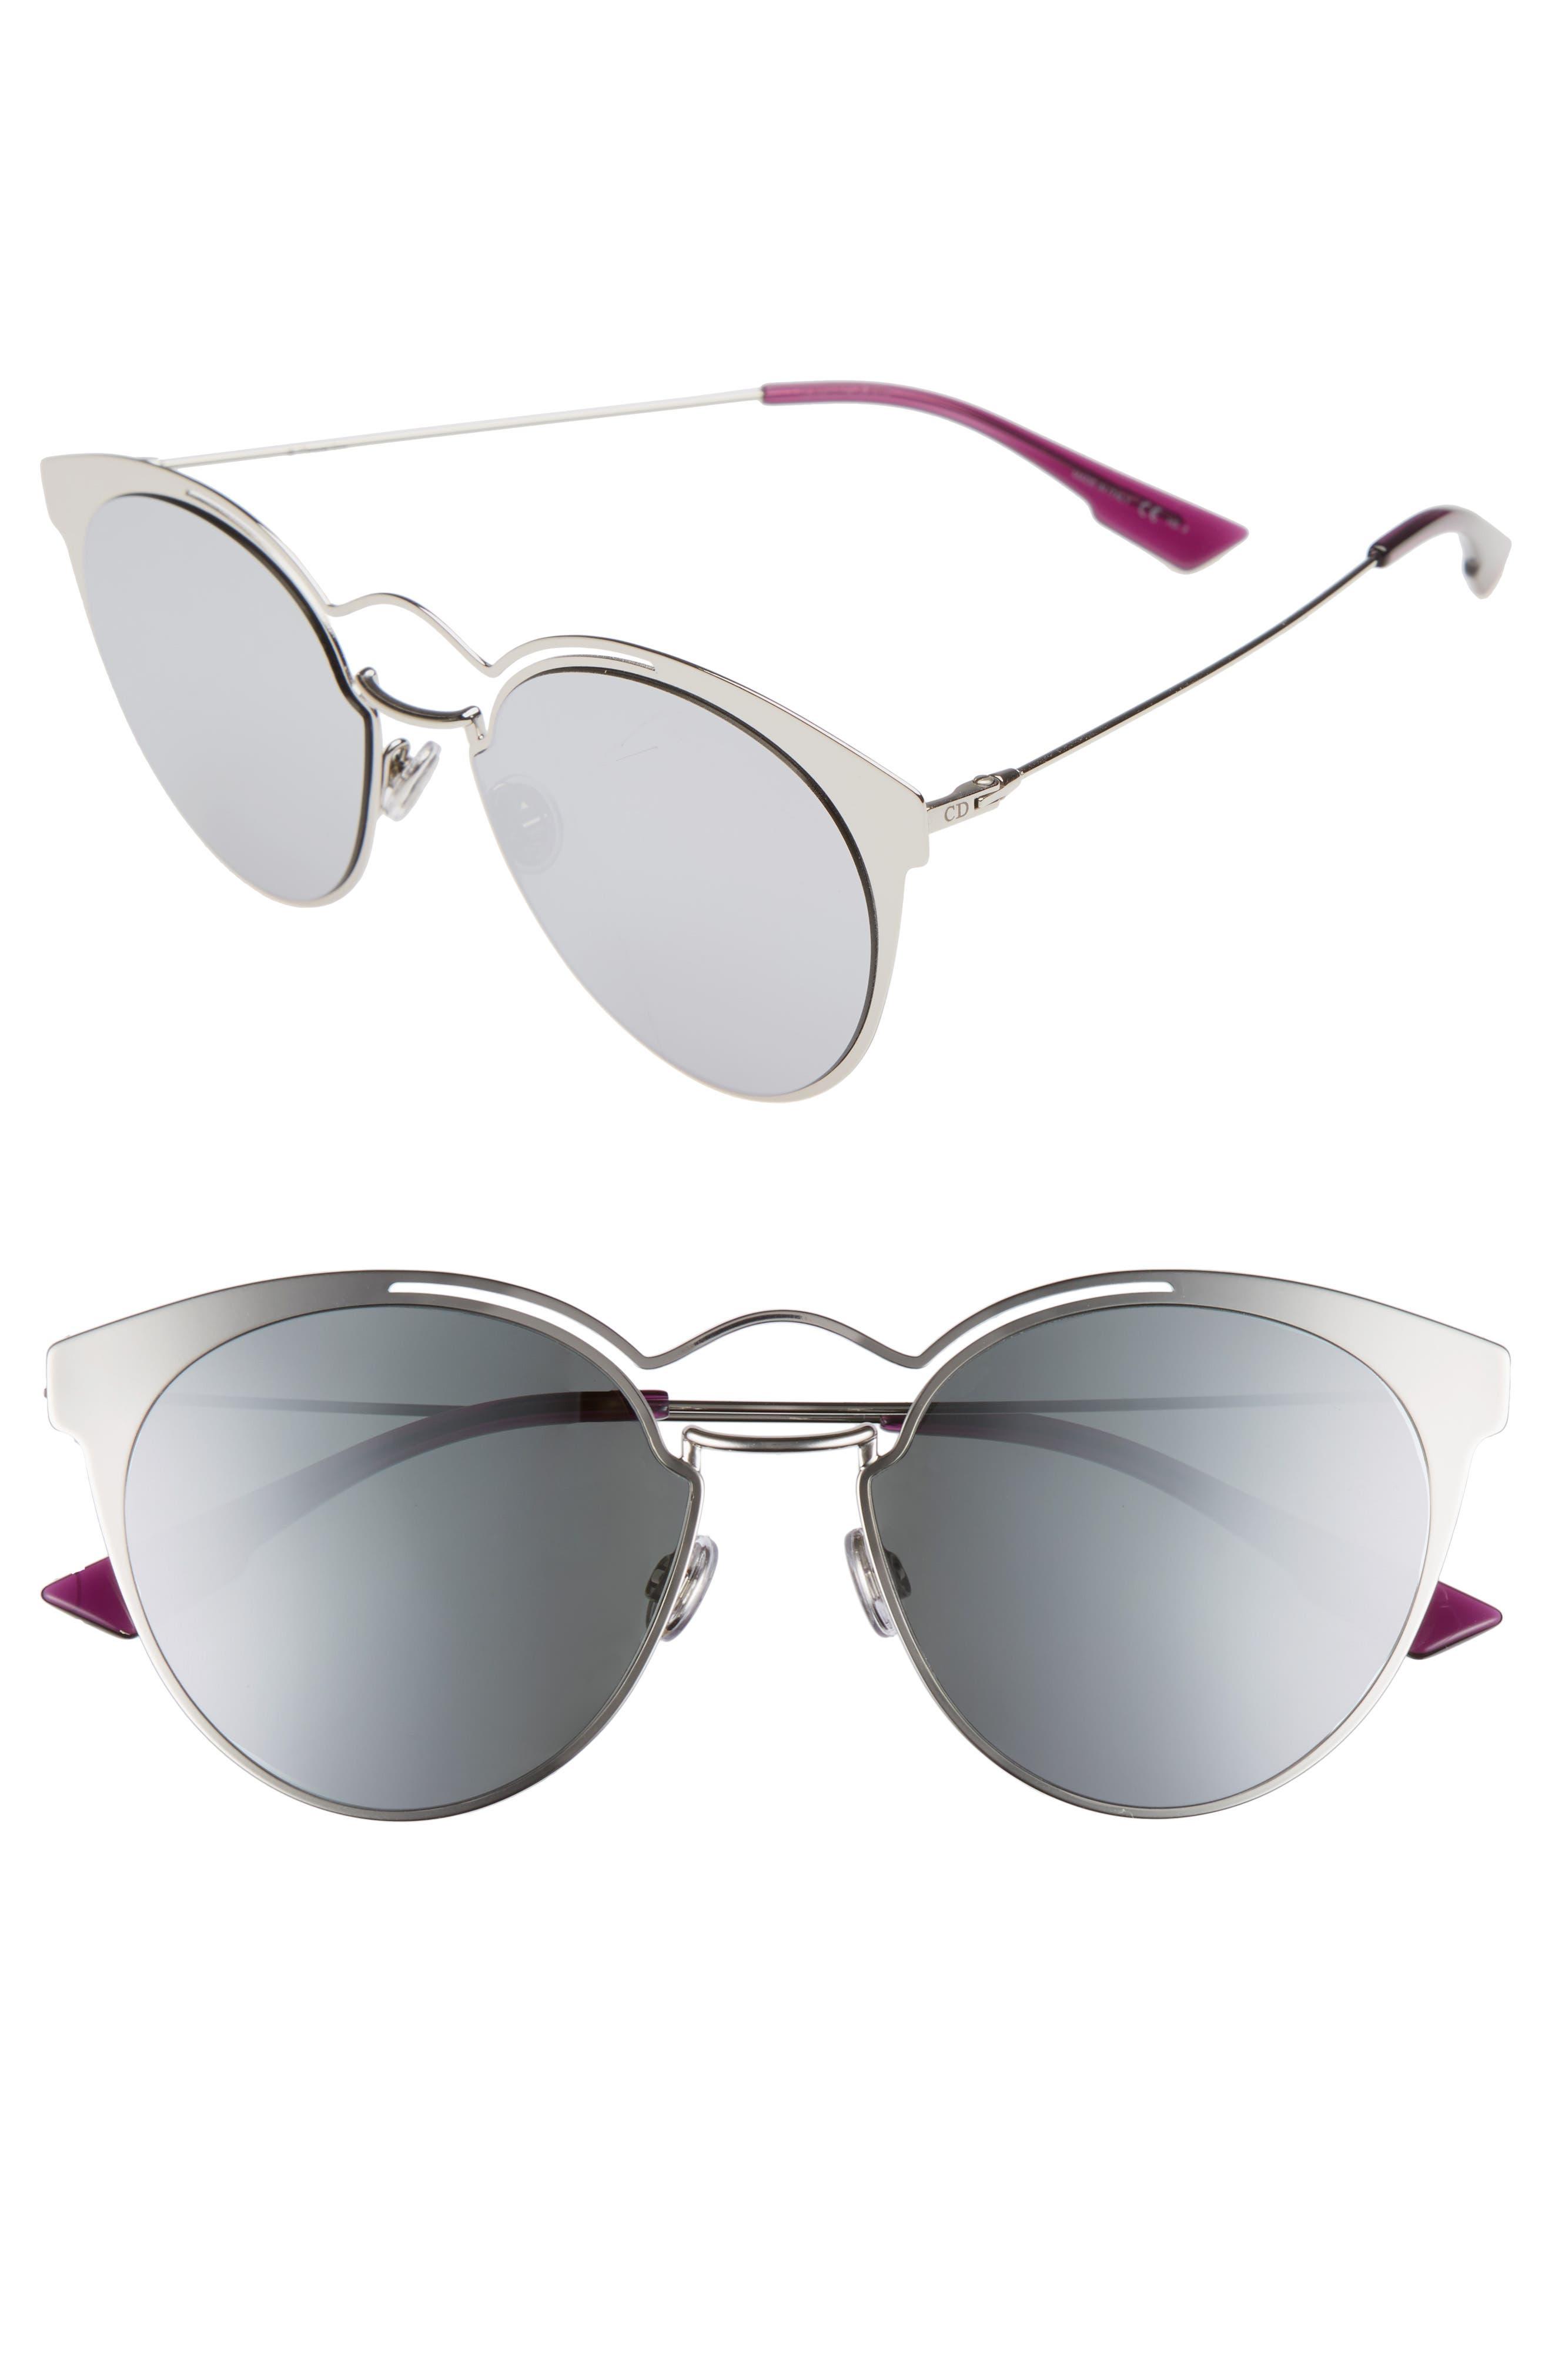 Main Image - Dior Nebuls 54mm Sunglasses